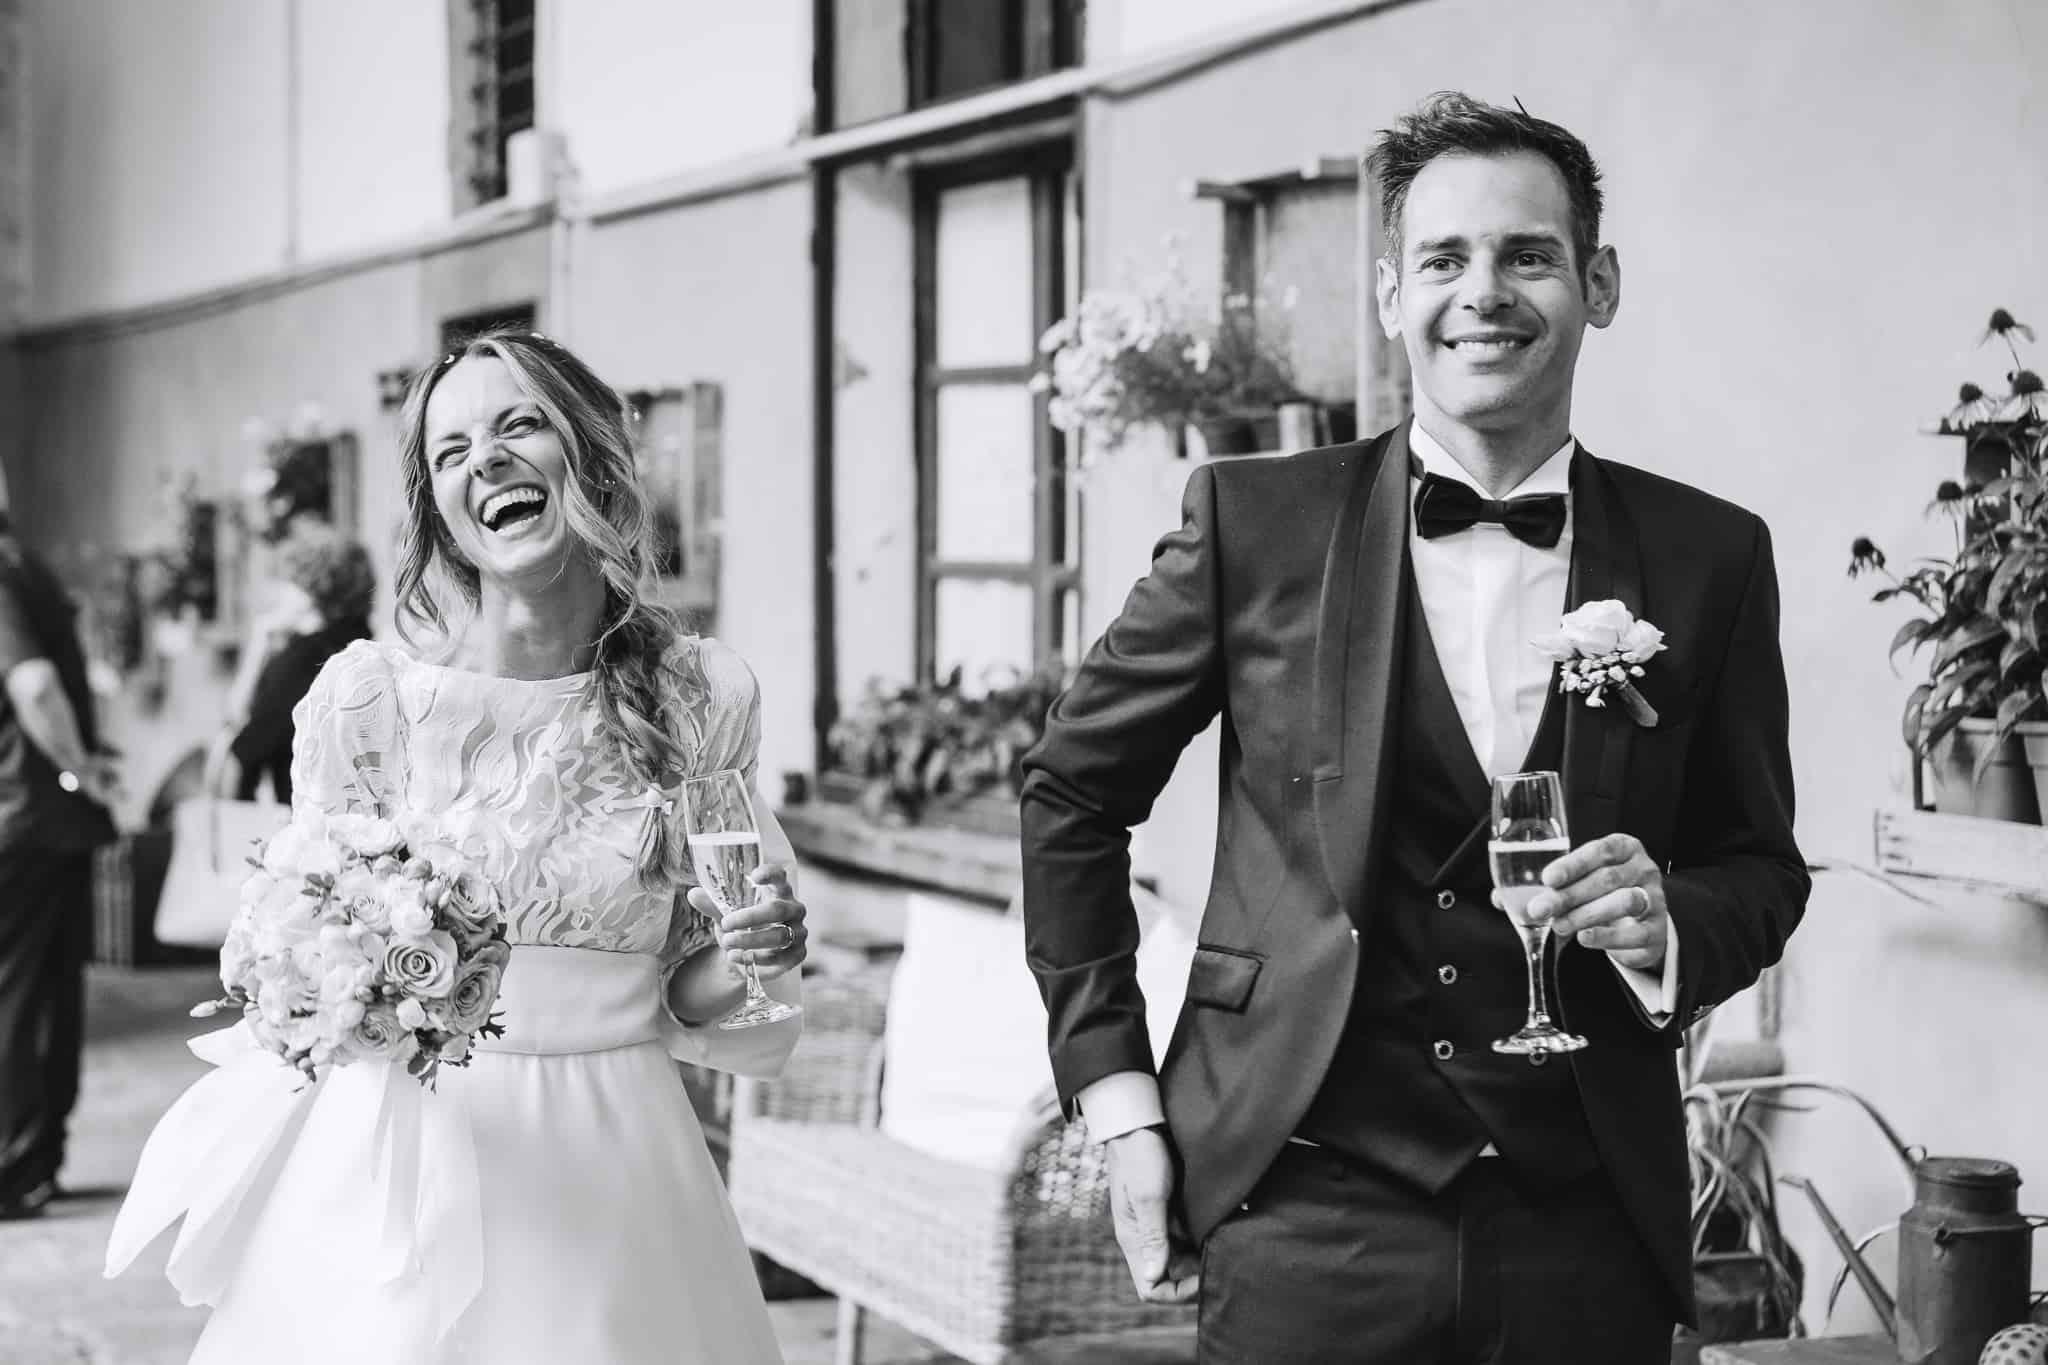 Ritratto spontaneo degli sposi, Sony A9